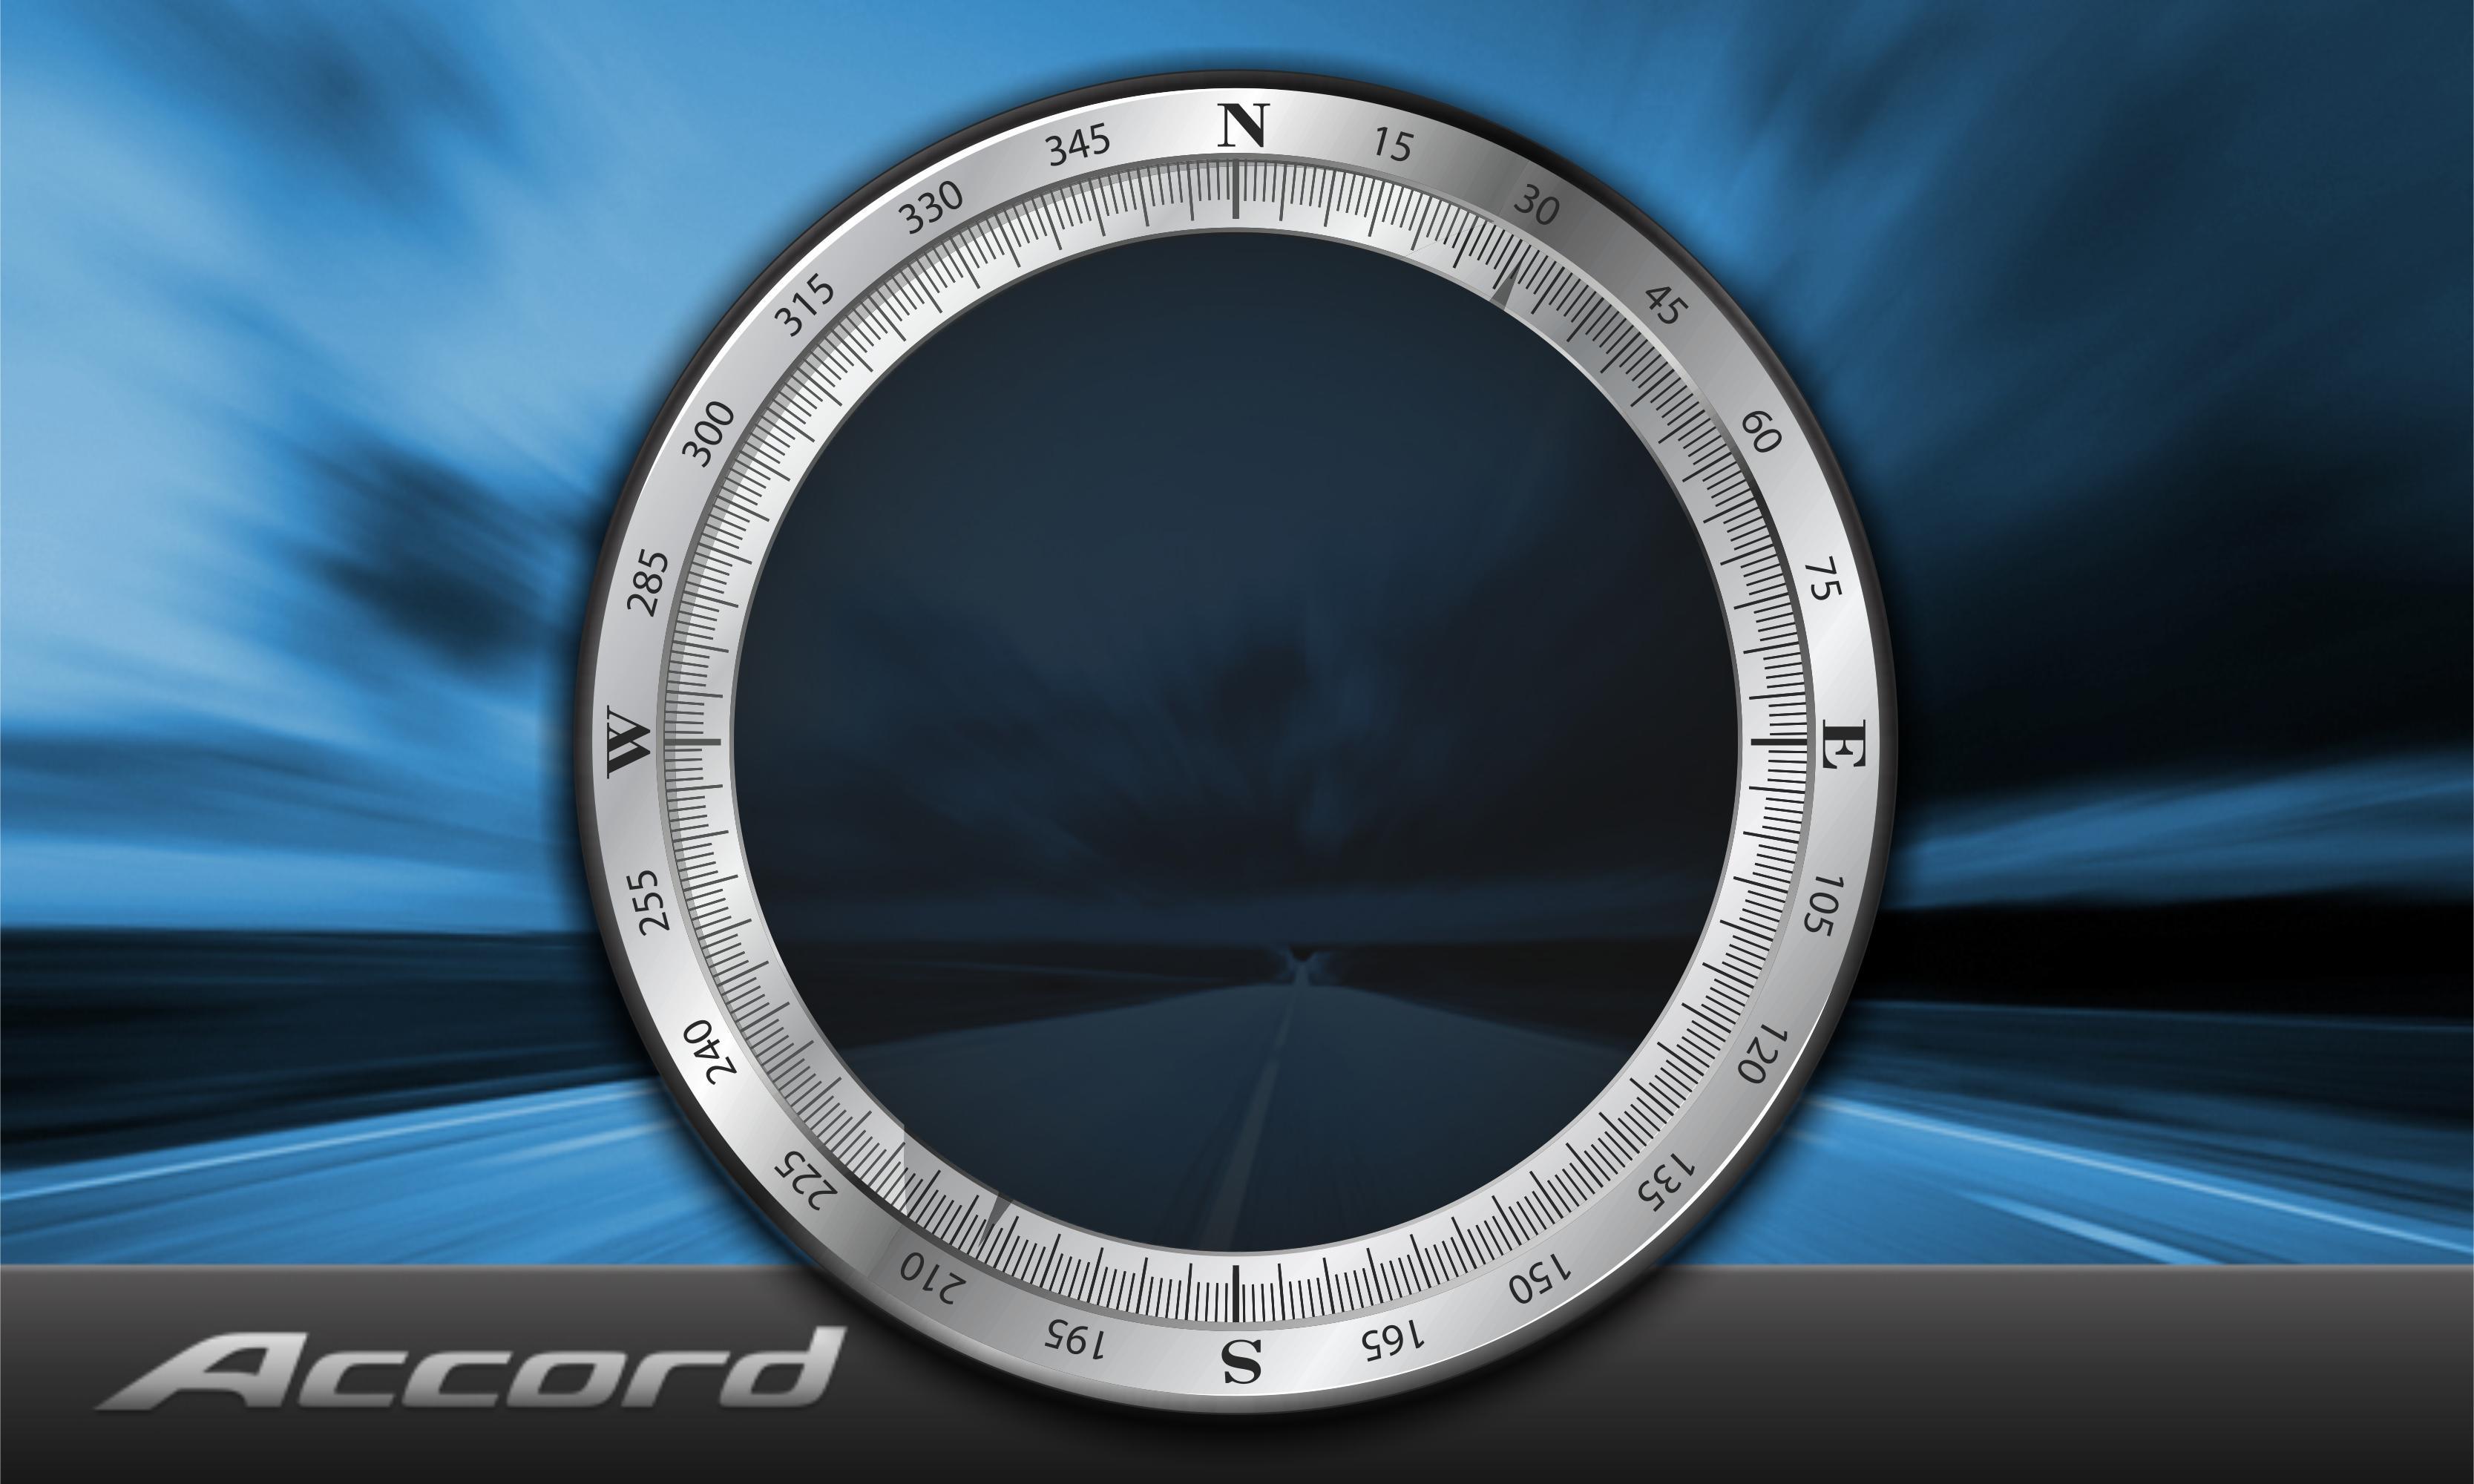 Honda Accord Clock Wallpaper Wallpapersafari